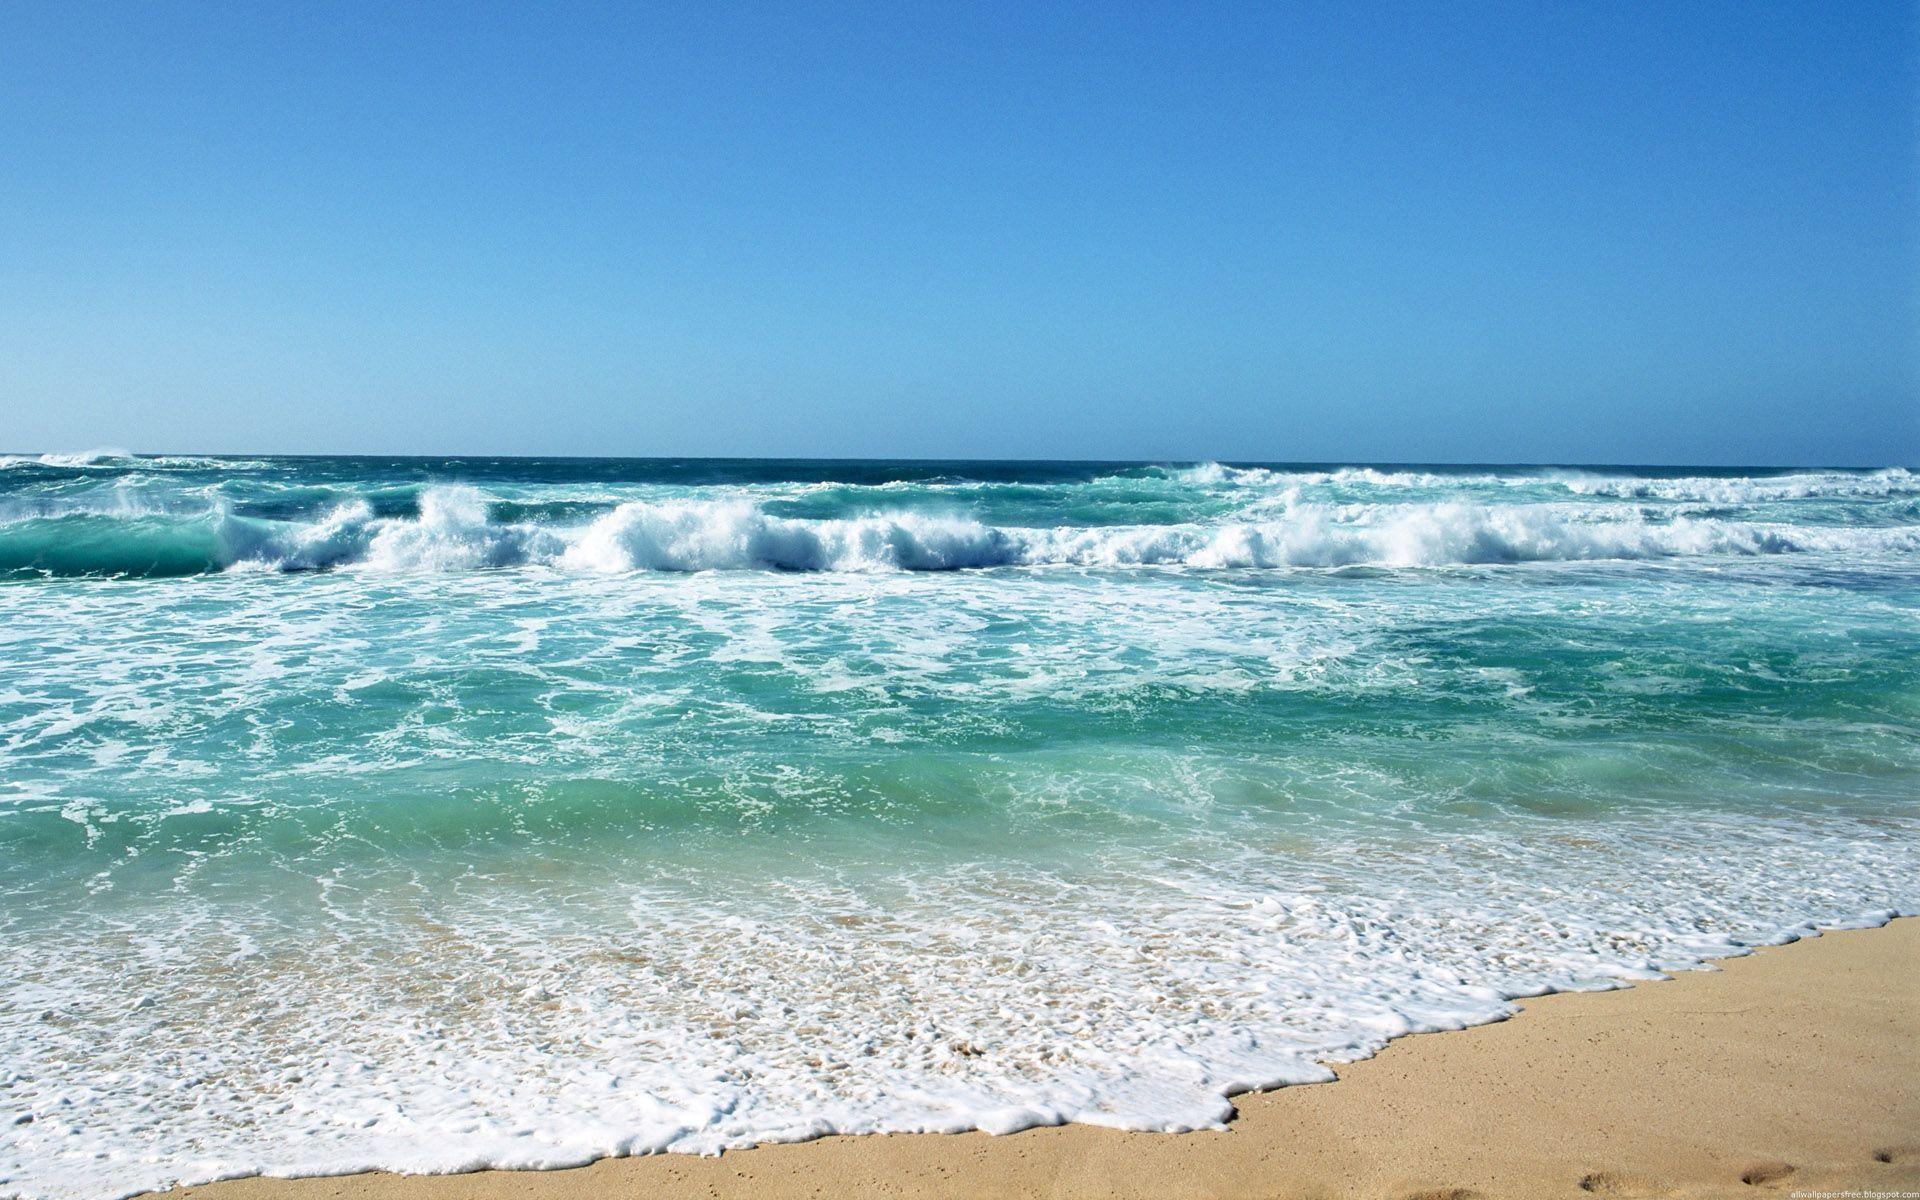 Ocean Sounds Nature Iphone Ipad Hd Wallpaper